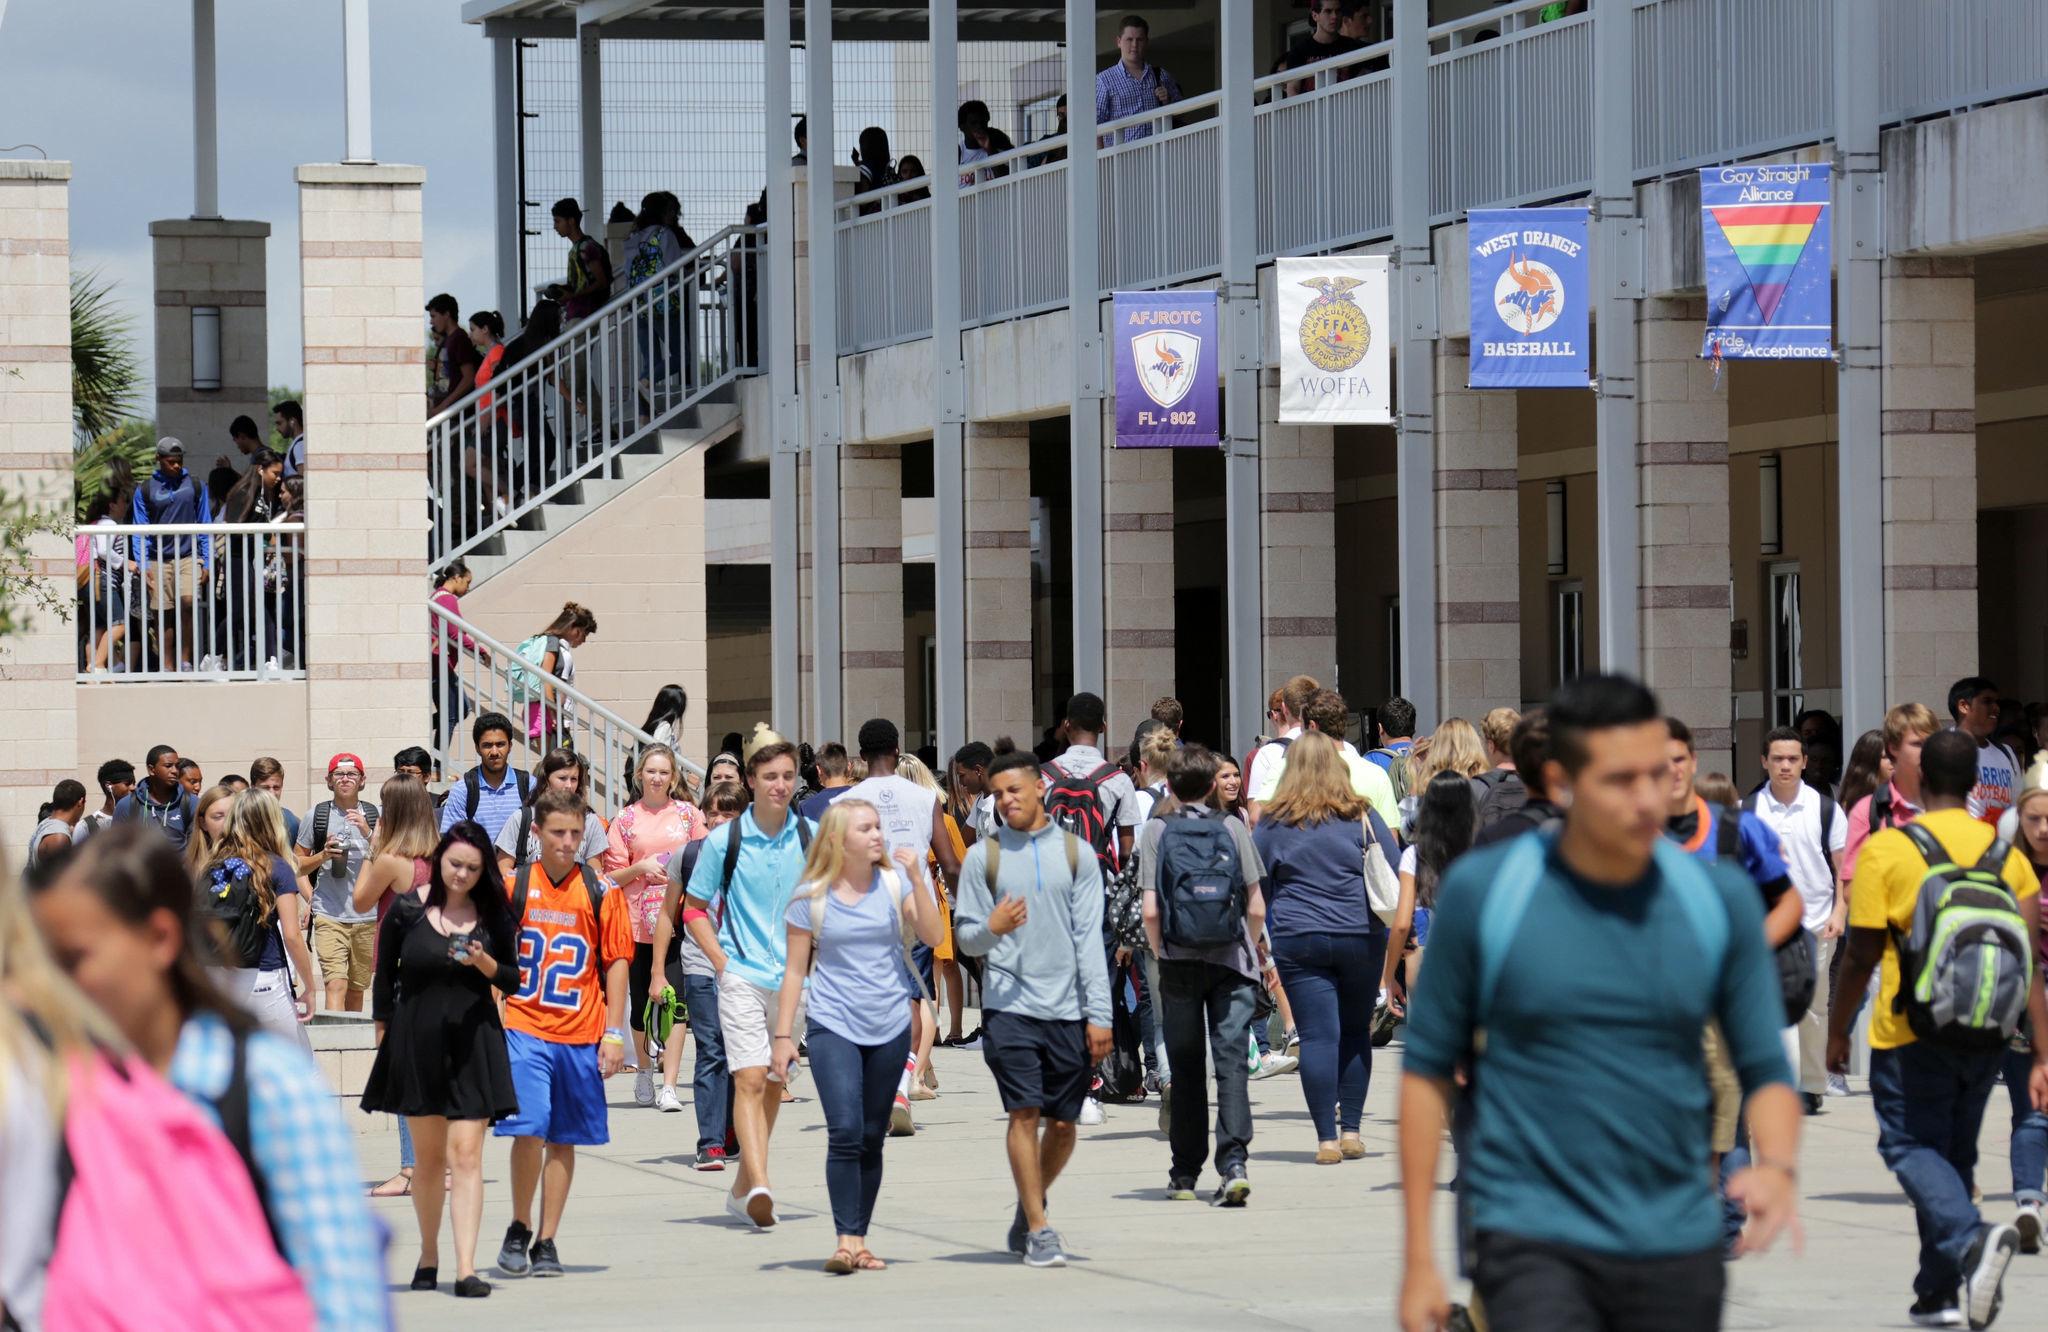 Orange County Students Will Start 2017 18 School Year On Aug 14